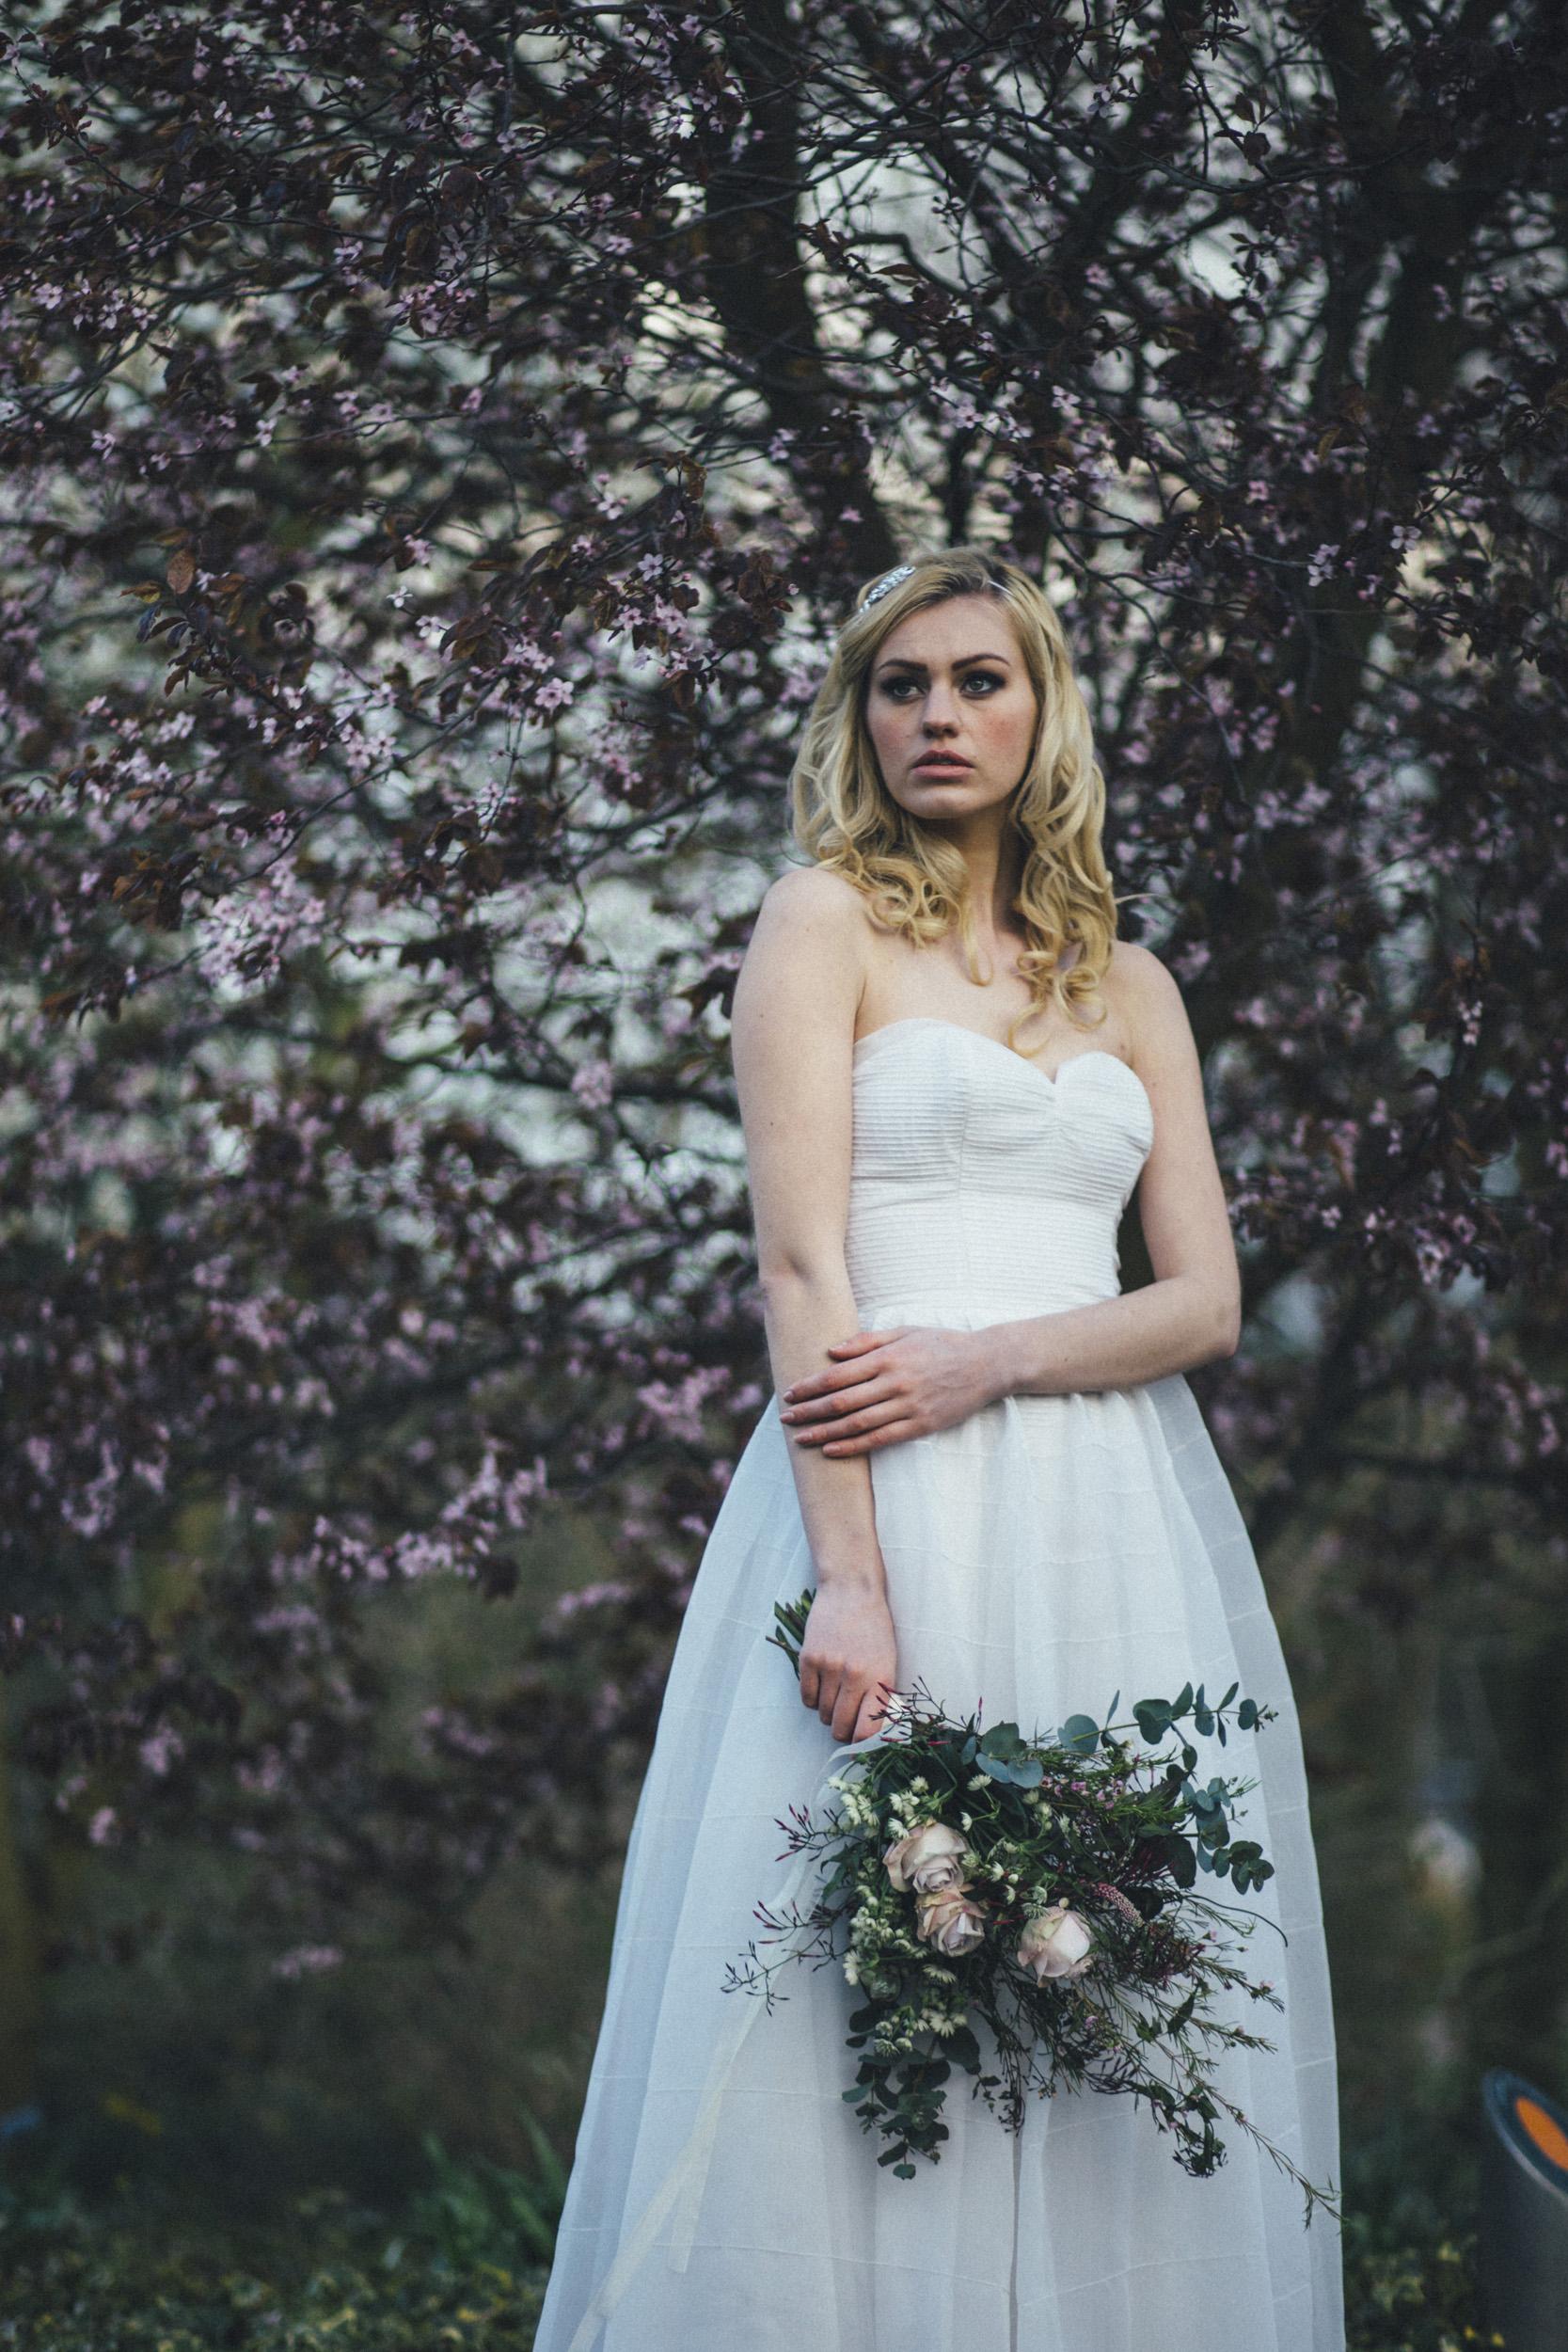 Spring-Bridal-Kate-Beaumont-Shelley-Richmond-Vintage-Wedding-Dress-22.jpg